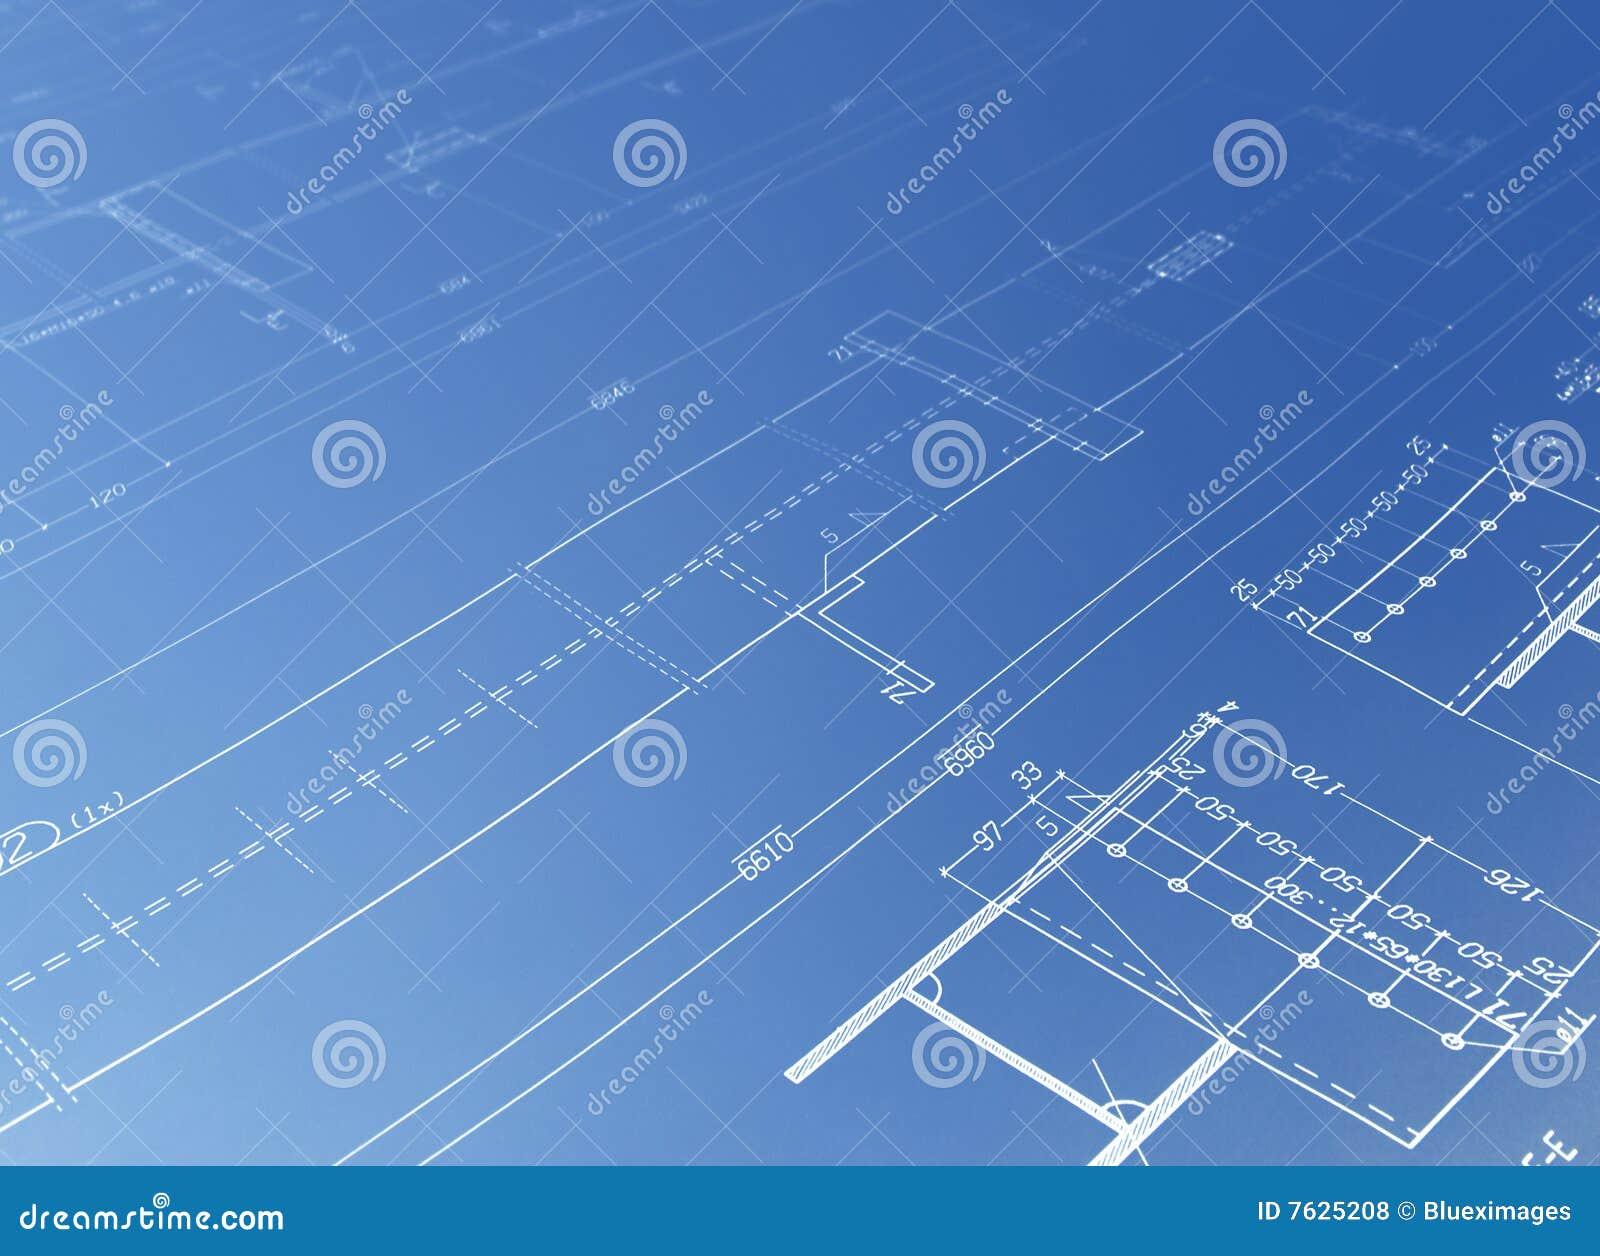 архитектурноакустический чертеж